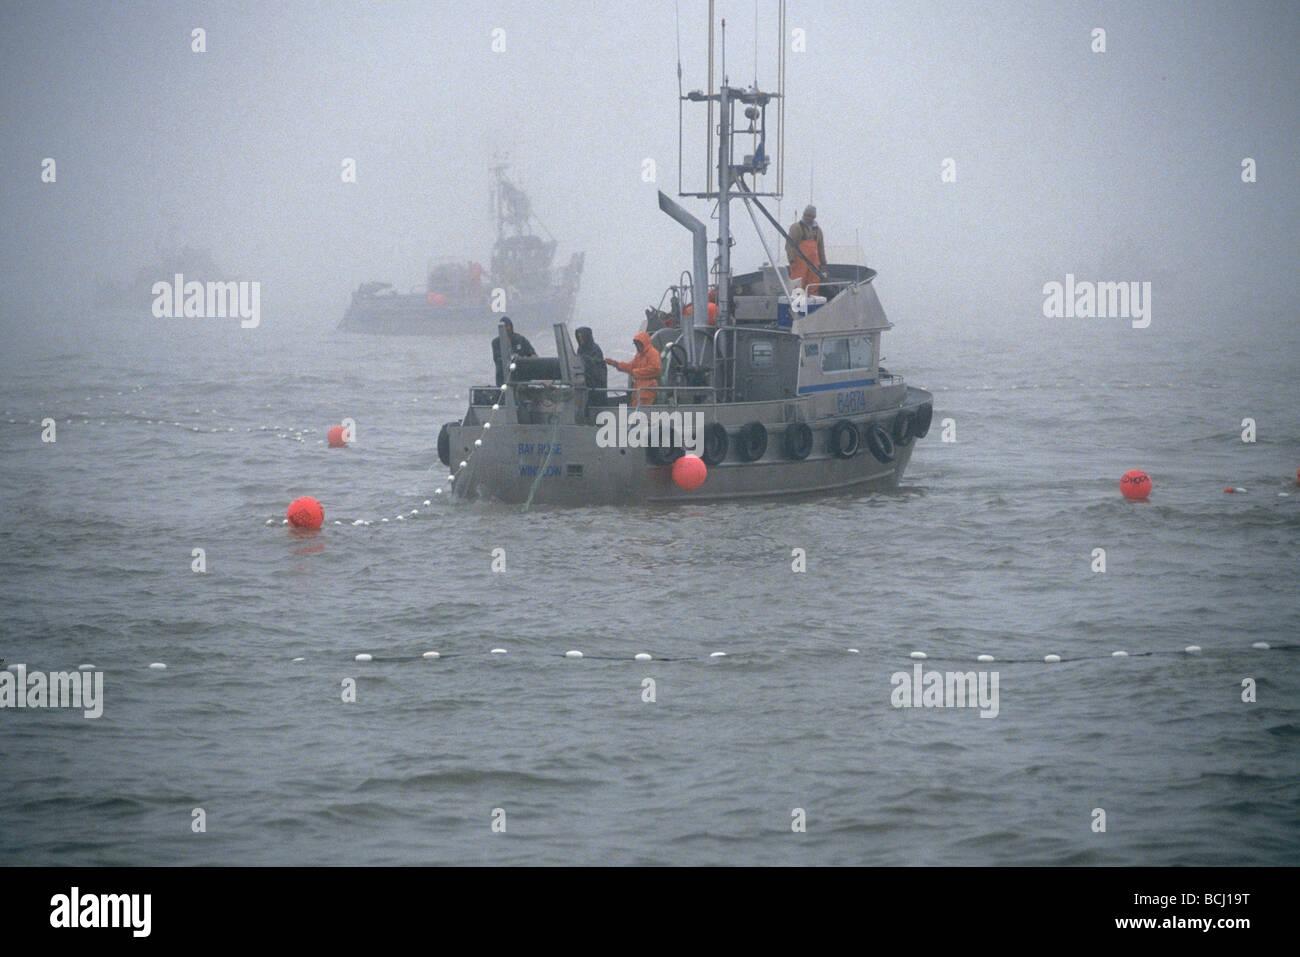 Bristol bay salmon fishing in southwest ak bad weather for Salmon fishing bay area